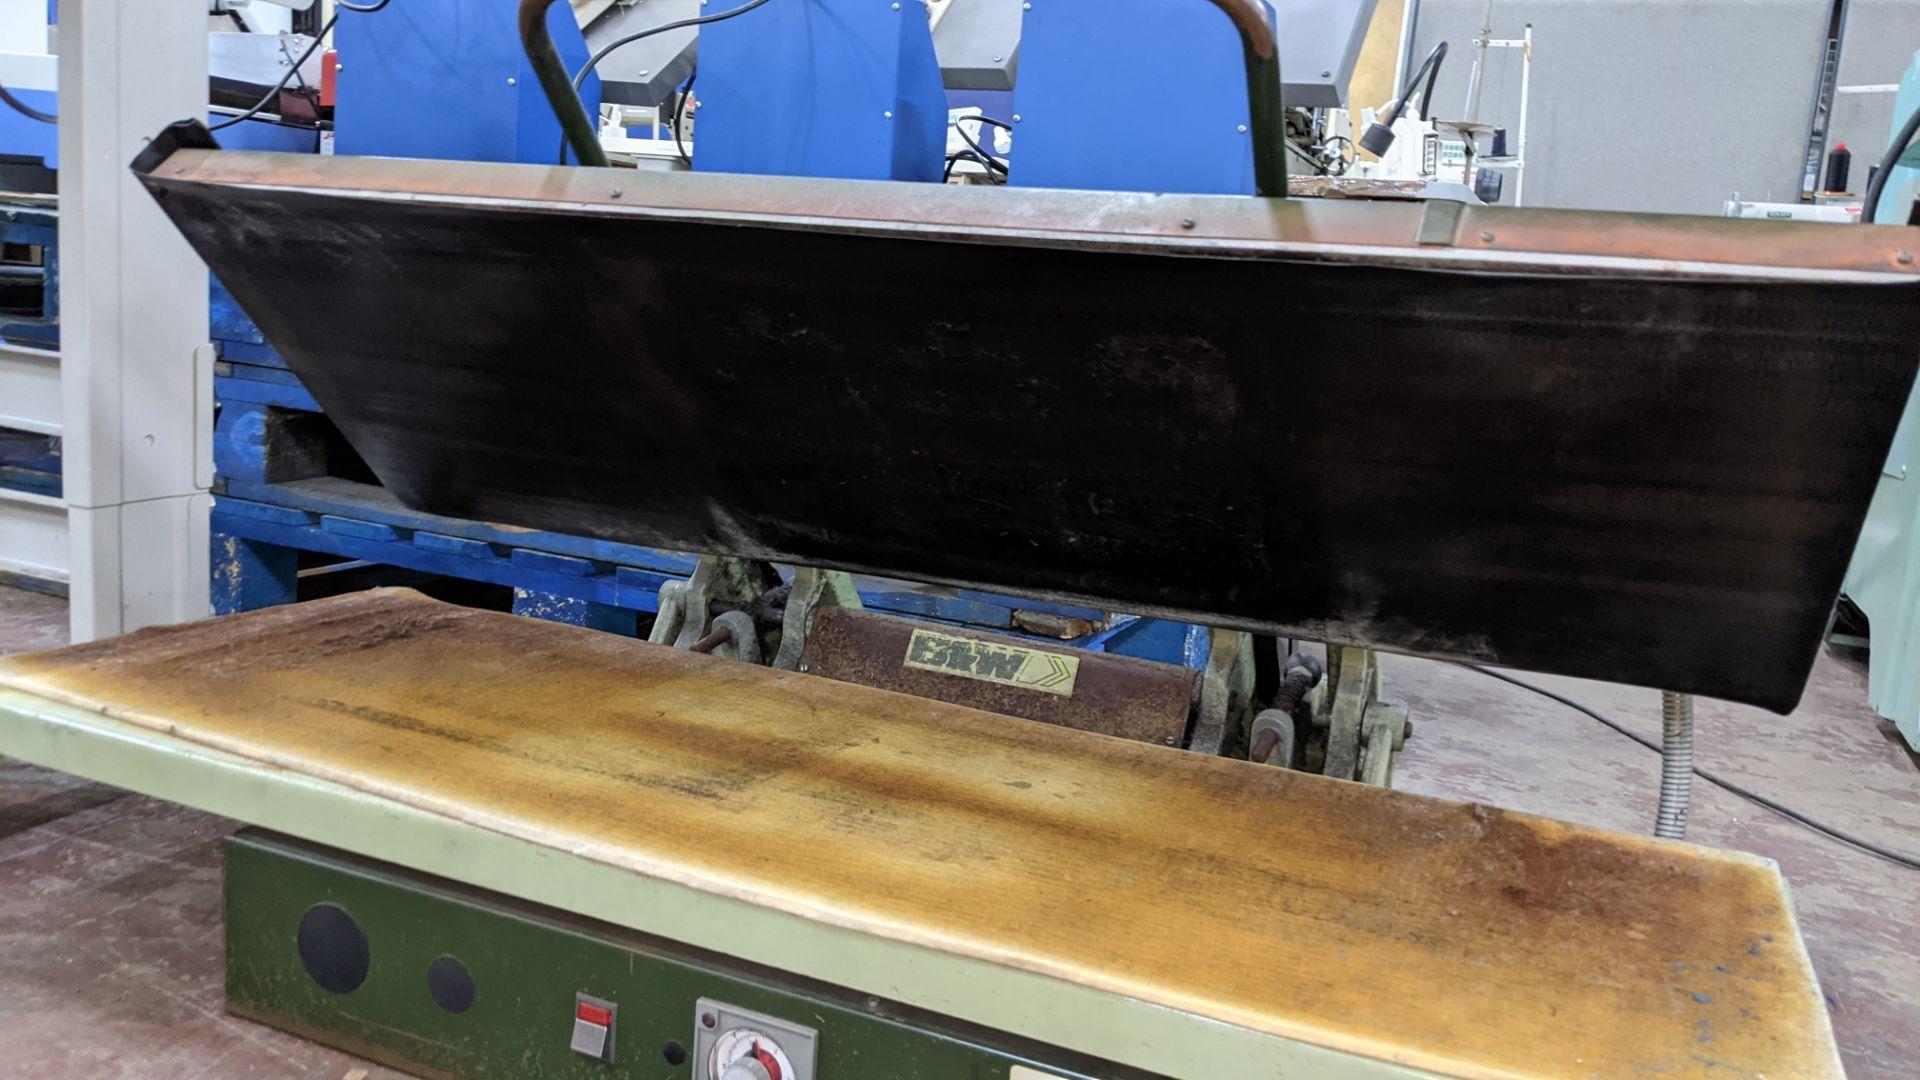 BW large benchtop heat press - Image 7 of 12